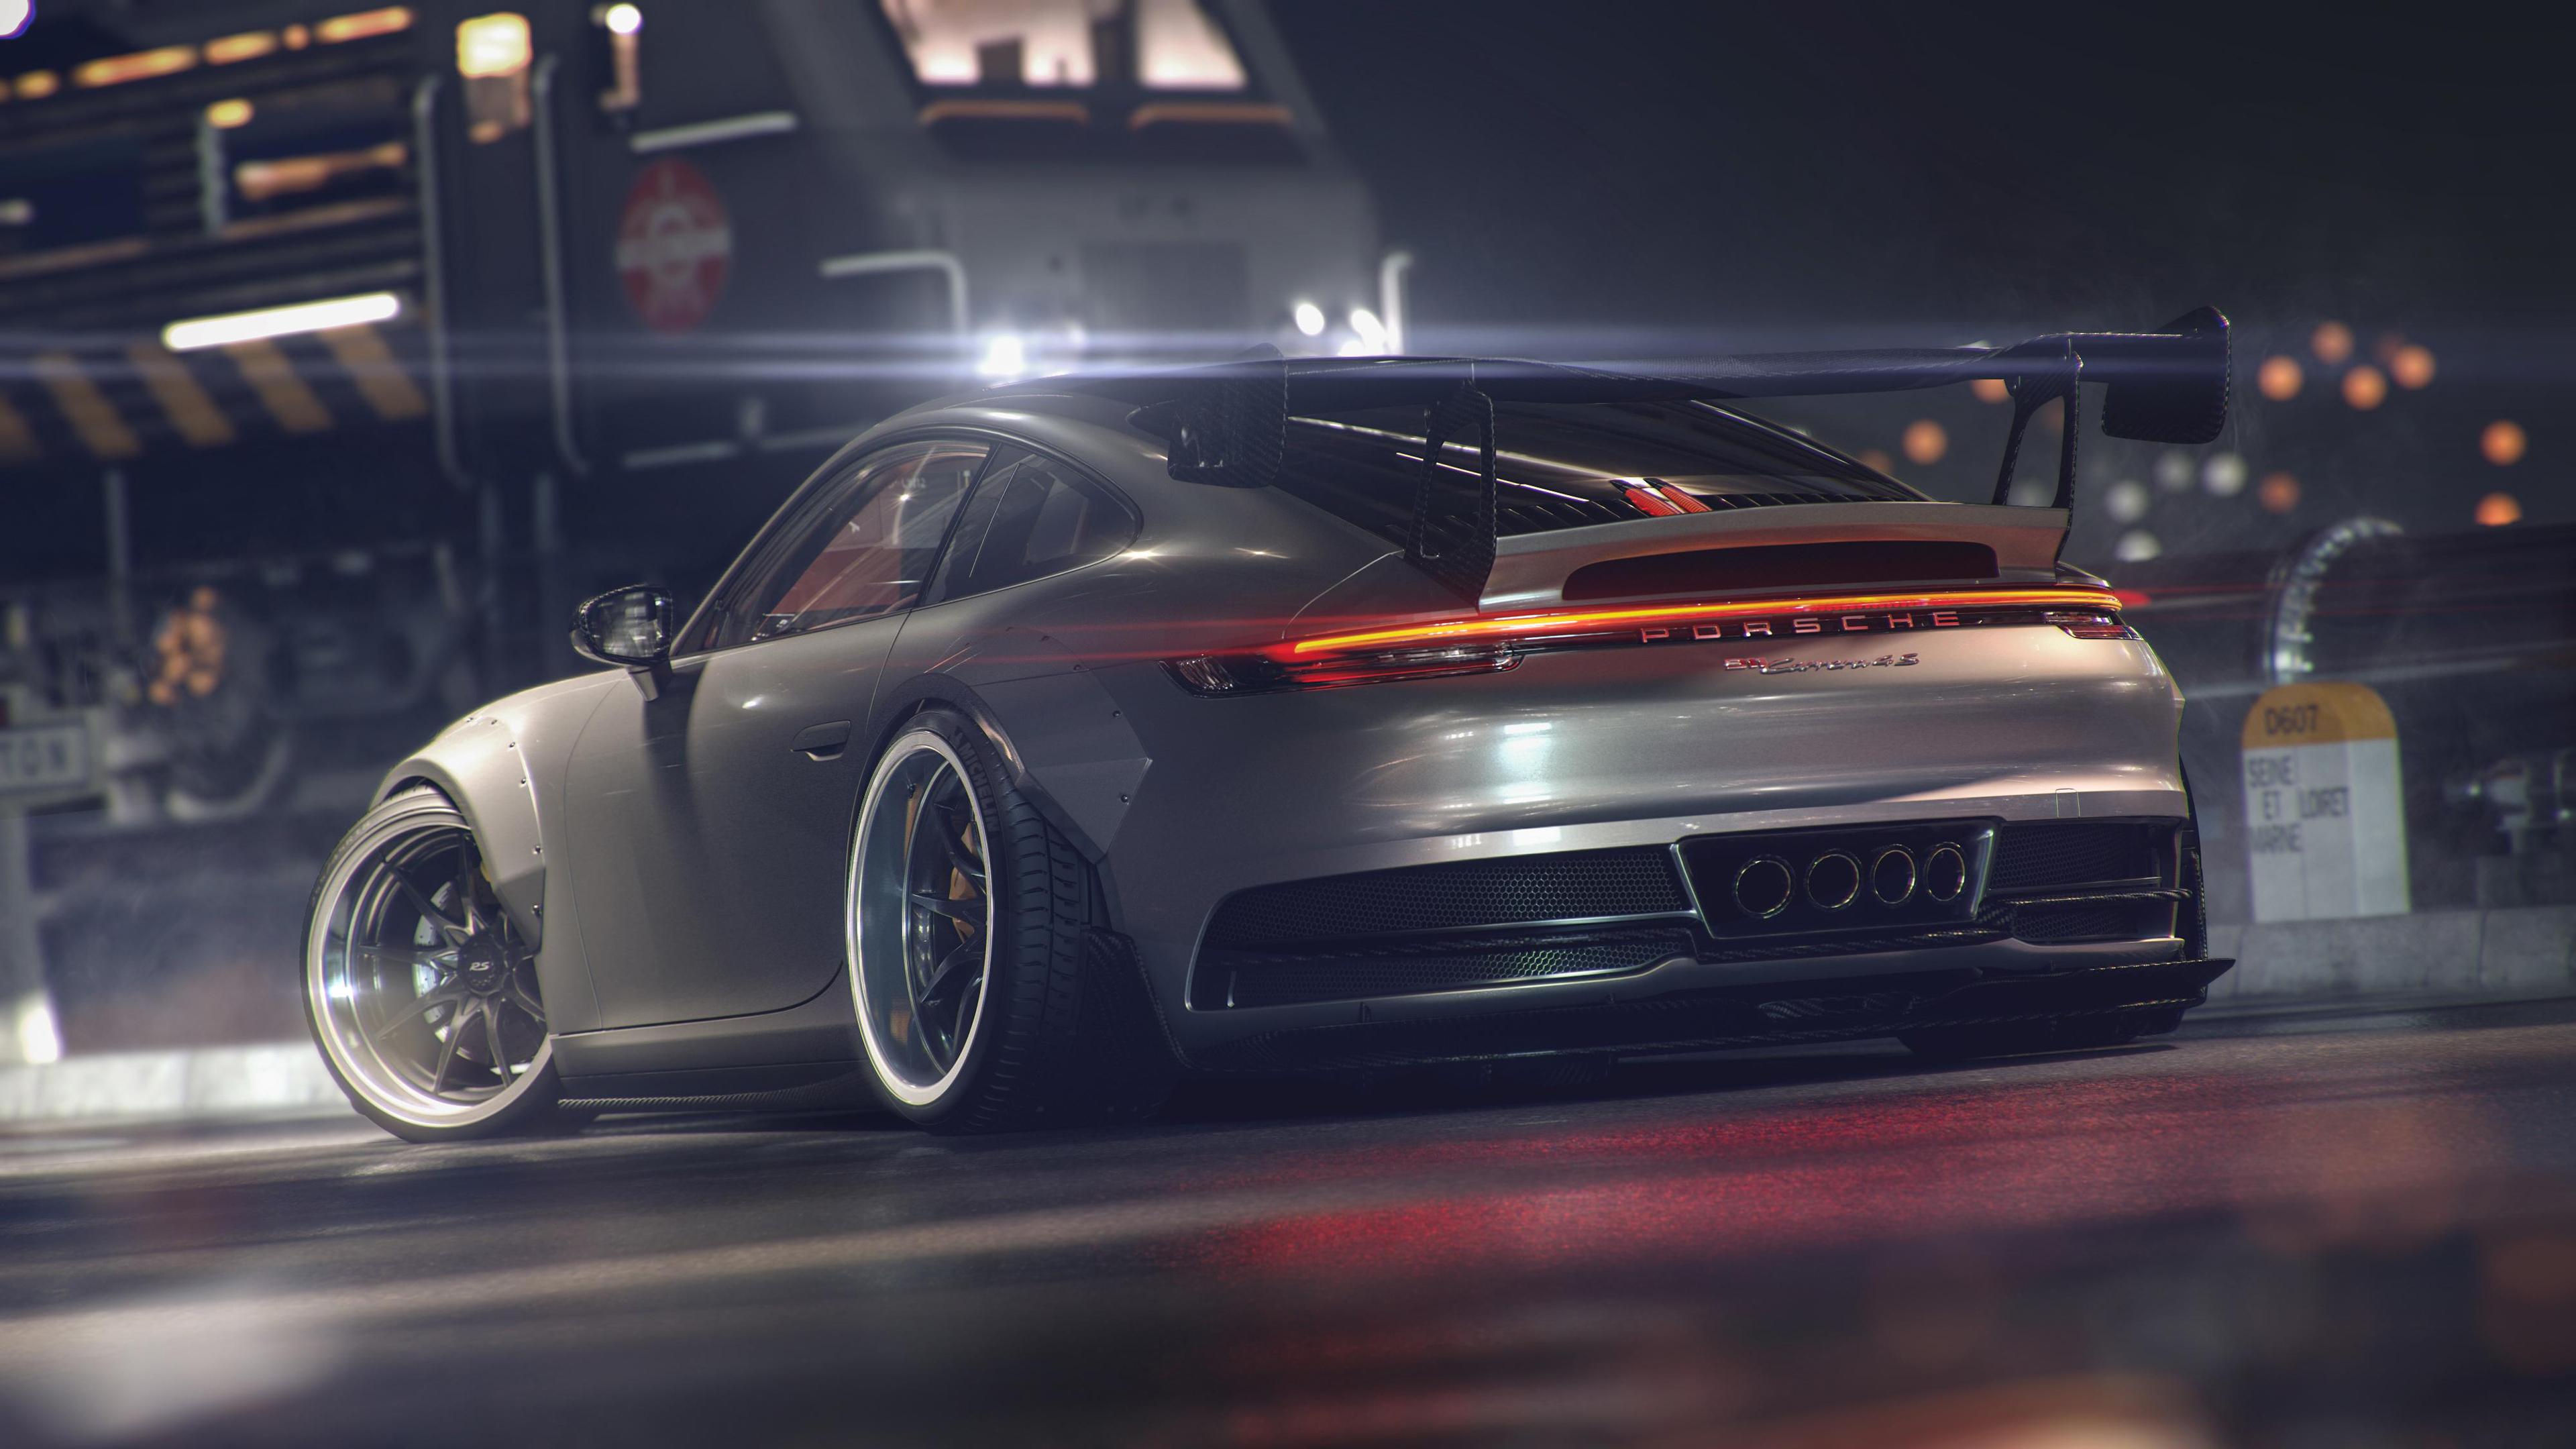 porsche gt3 911 gt rear 4k 1554245175 - Porsche GT3 911 GT Rear 4k - porsche wallpapers, porsche gt3 wallpapers, hd-wallpapers, cars wallpapers, behance wallpapers, 4k-wallpapers